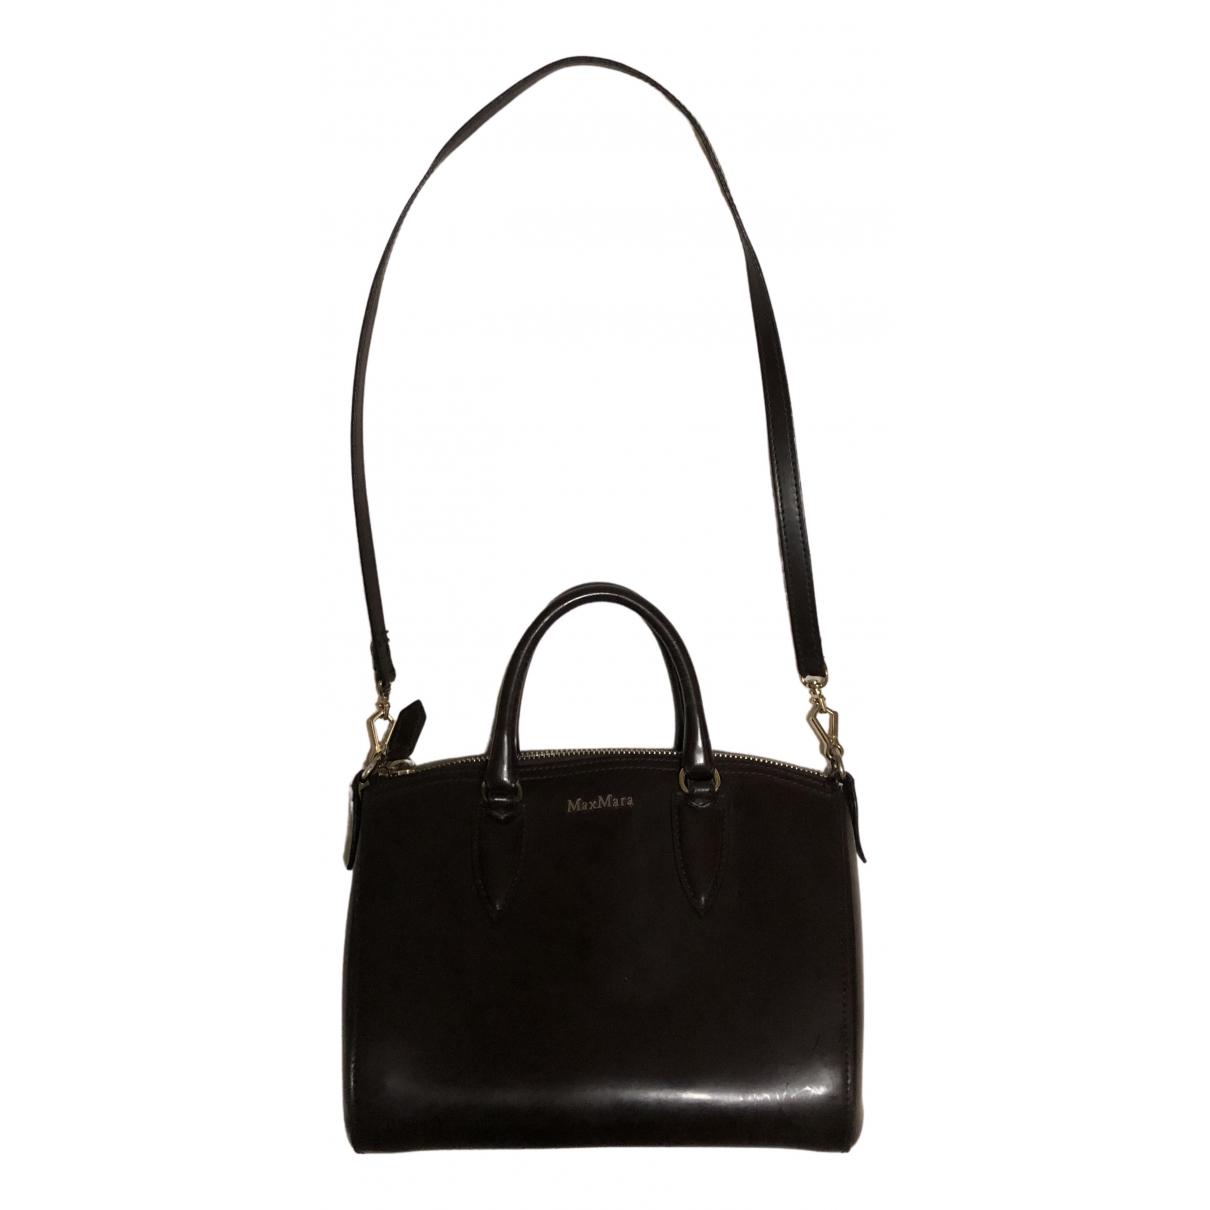 Max Mara N Brown Leather handbag for Women N